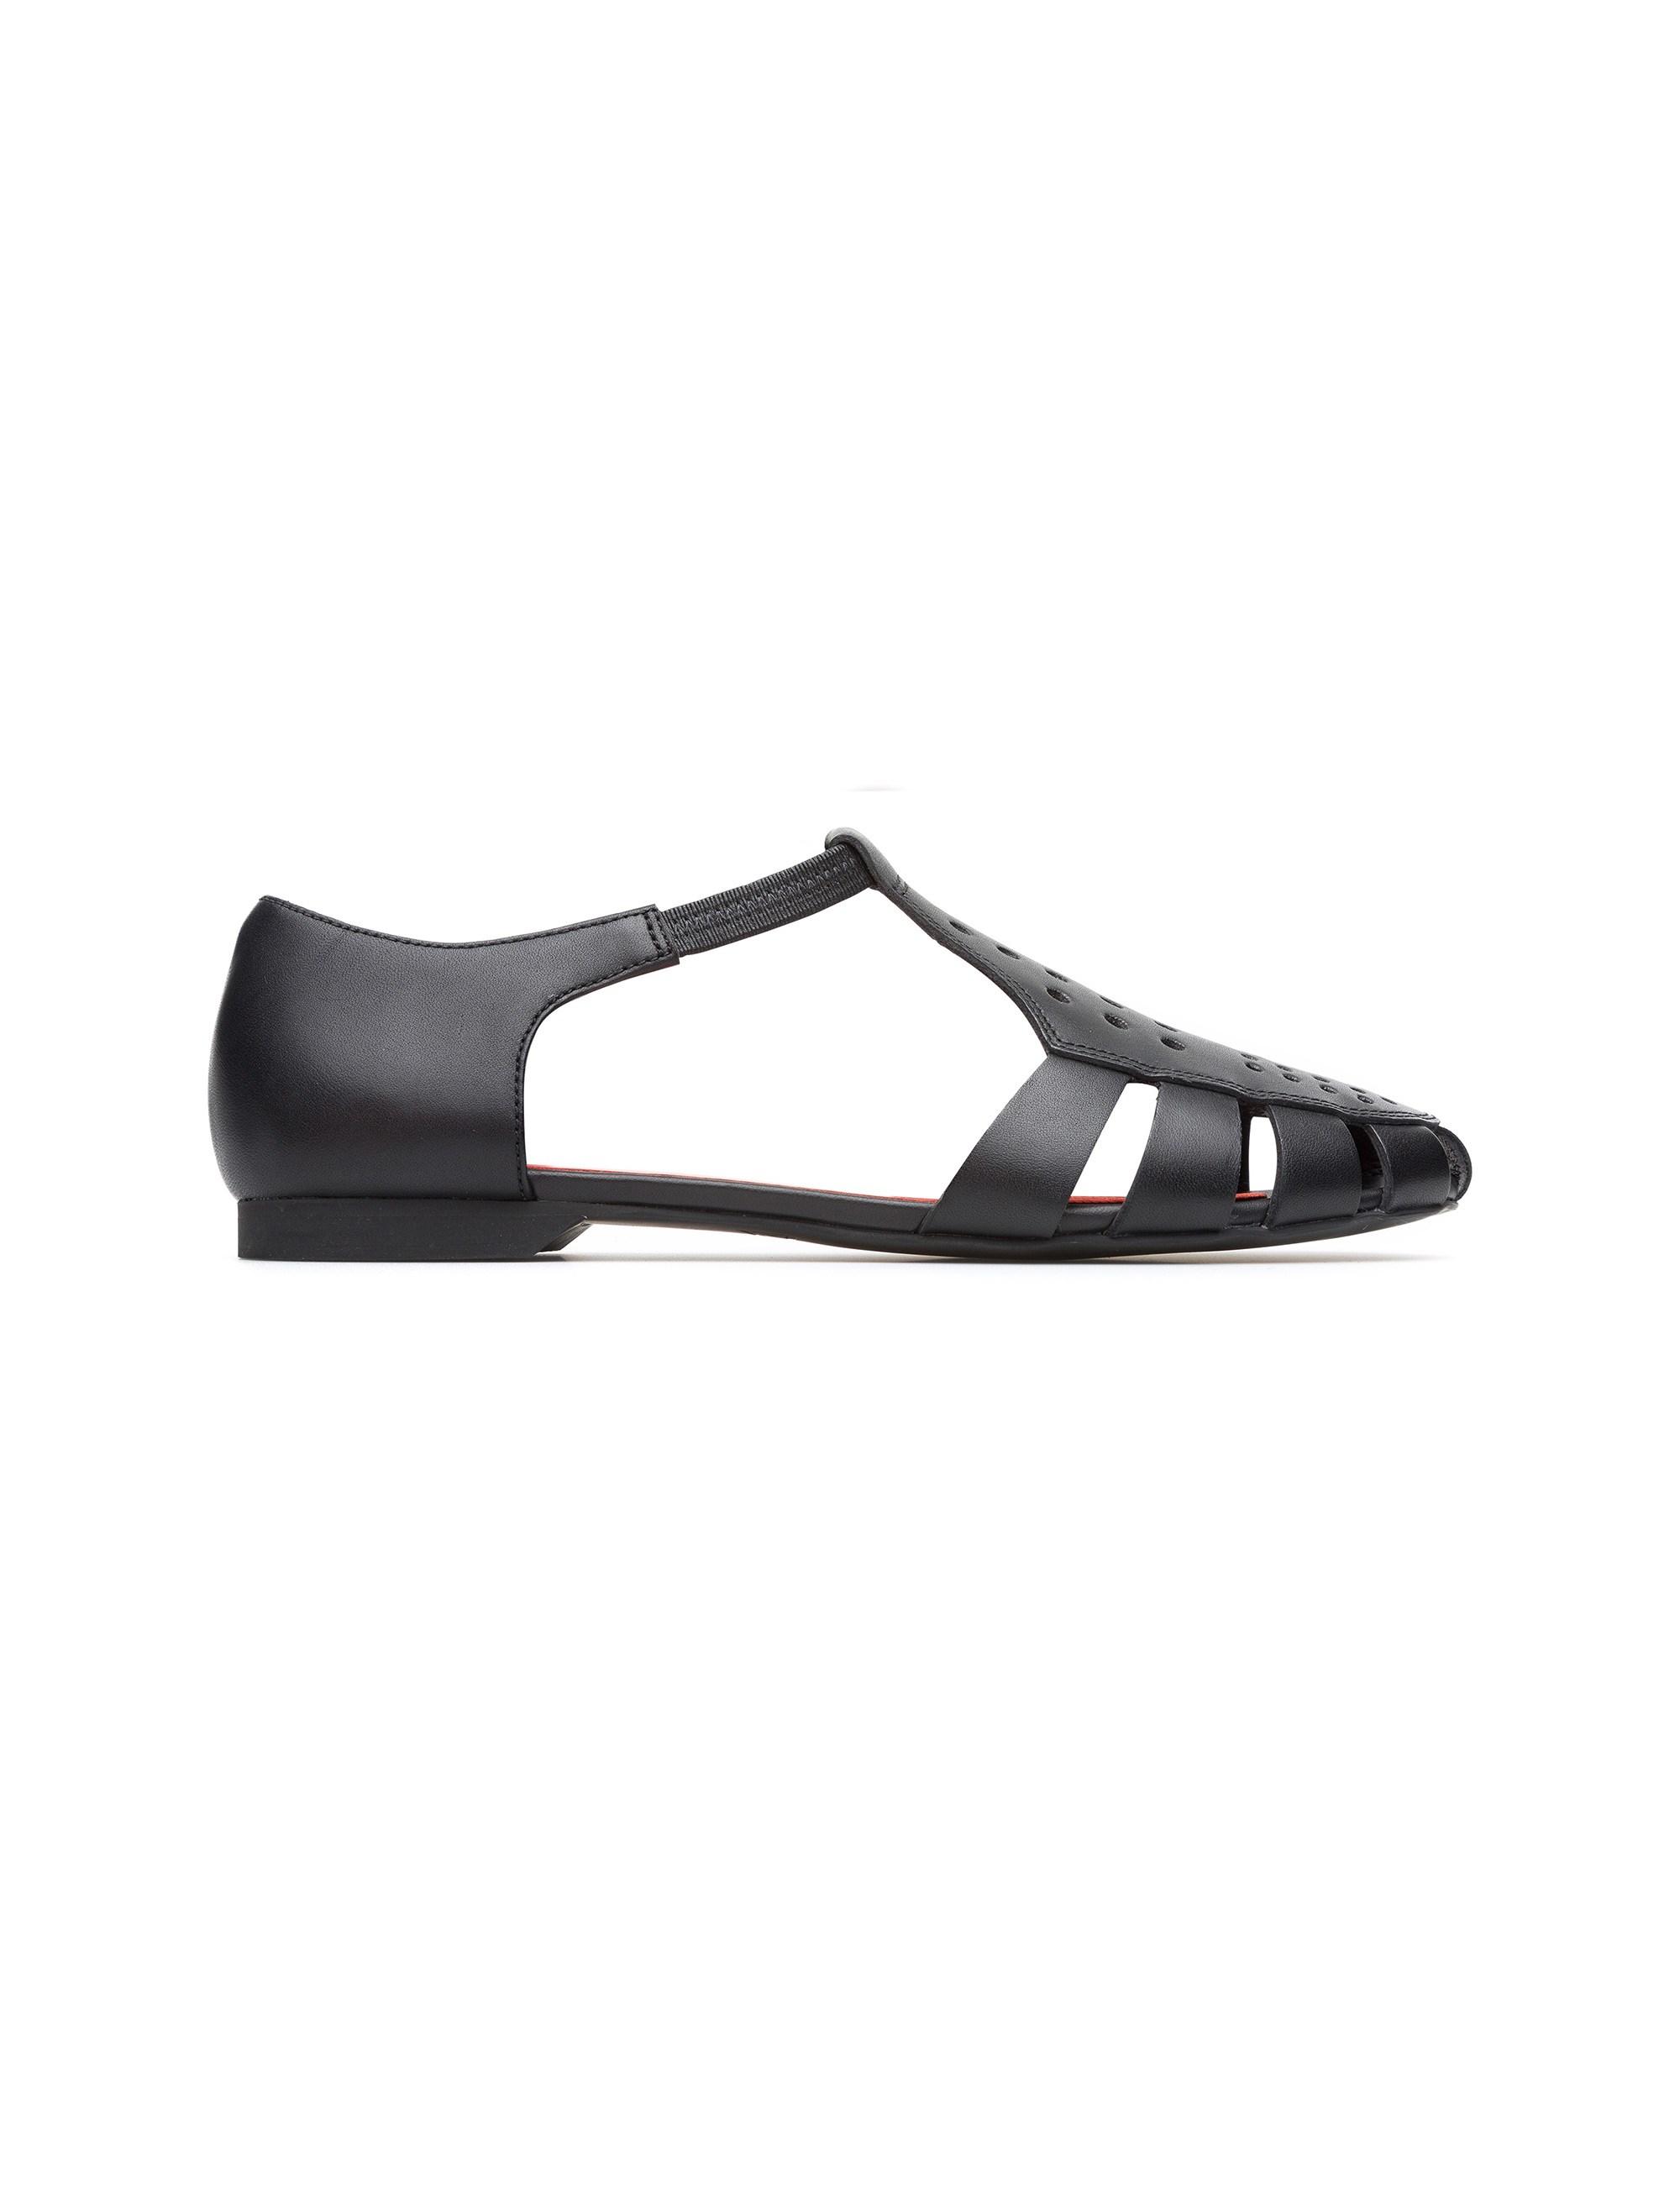 کفش چرم تخت زنانه Servolux - مشکي - 1